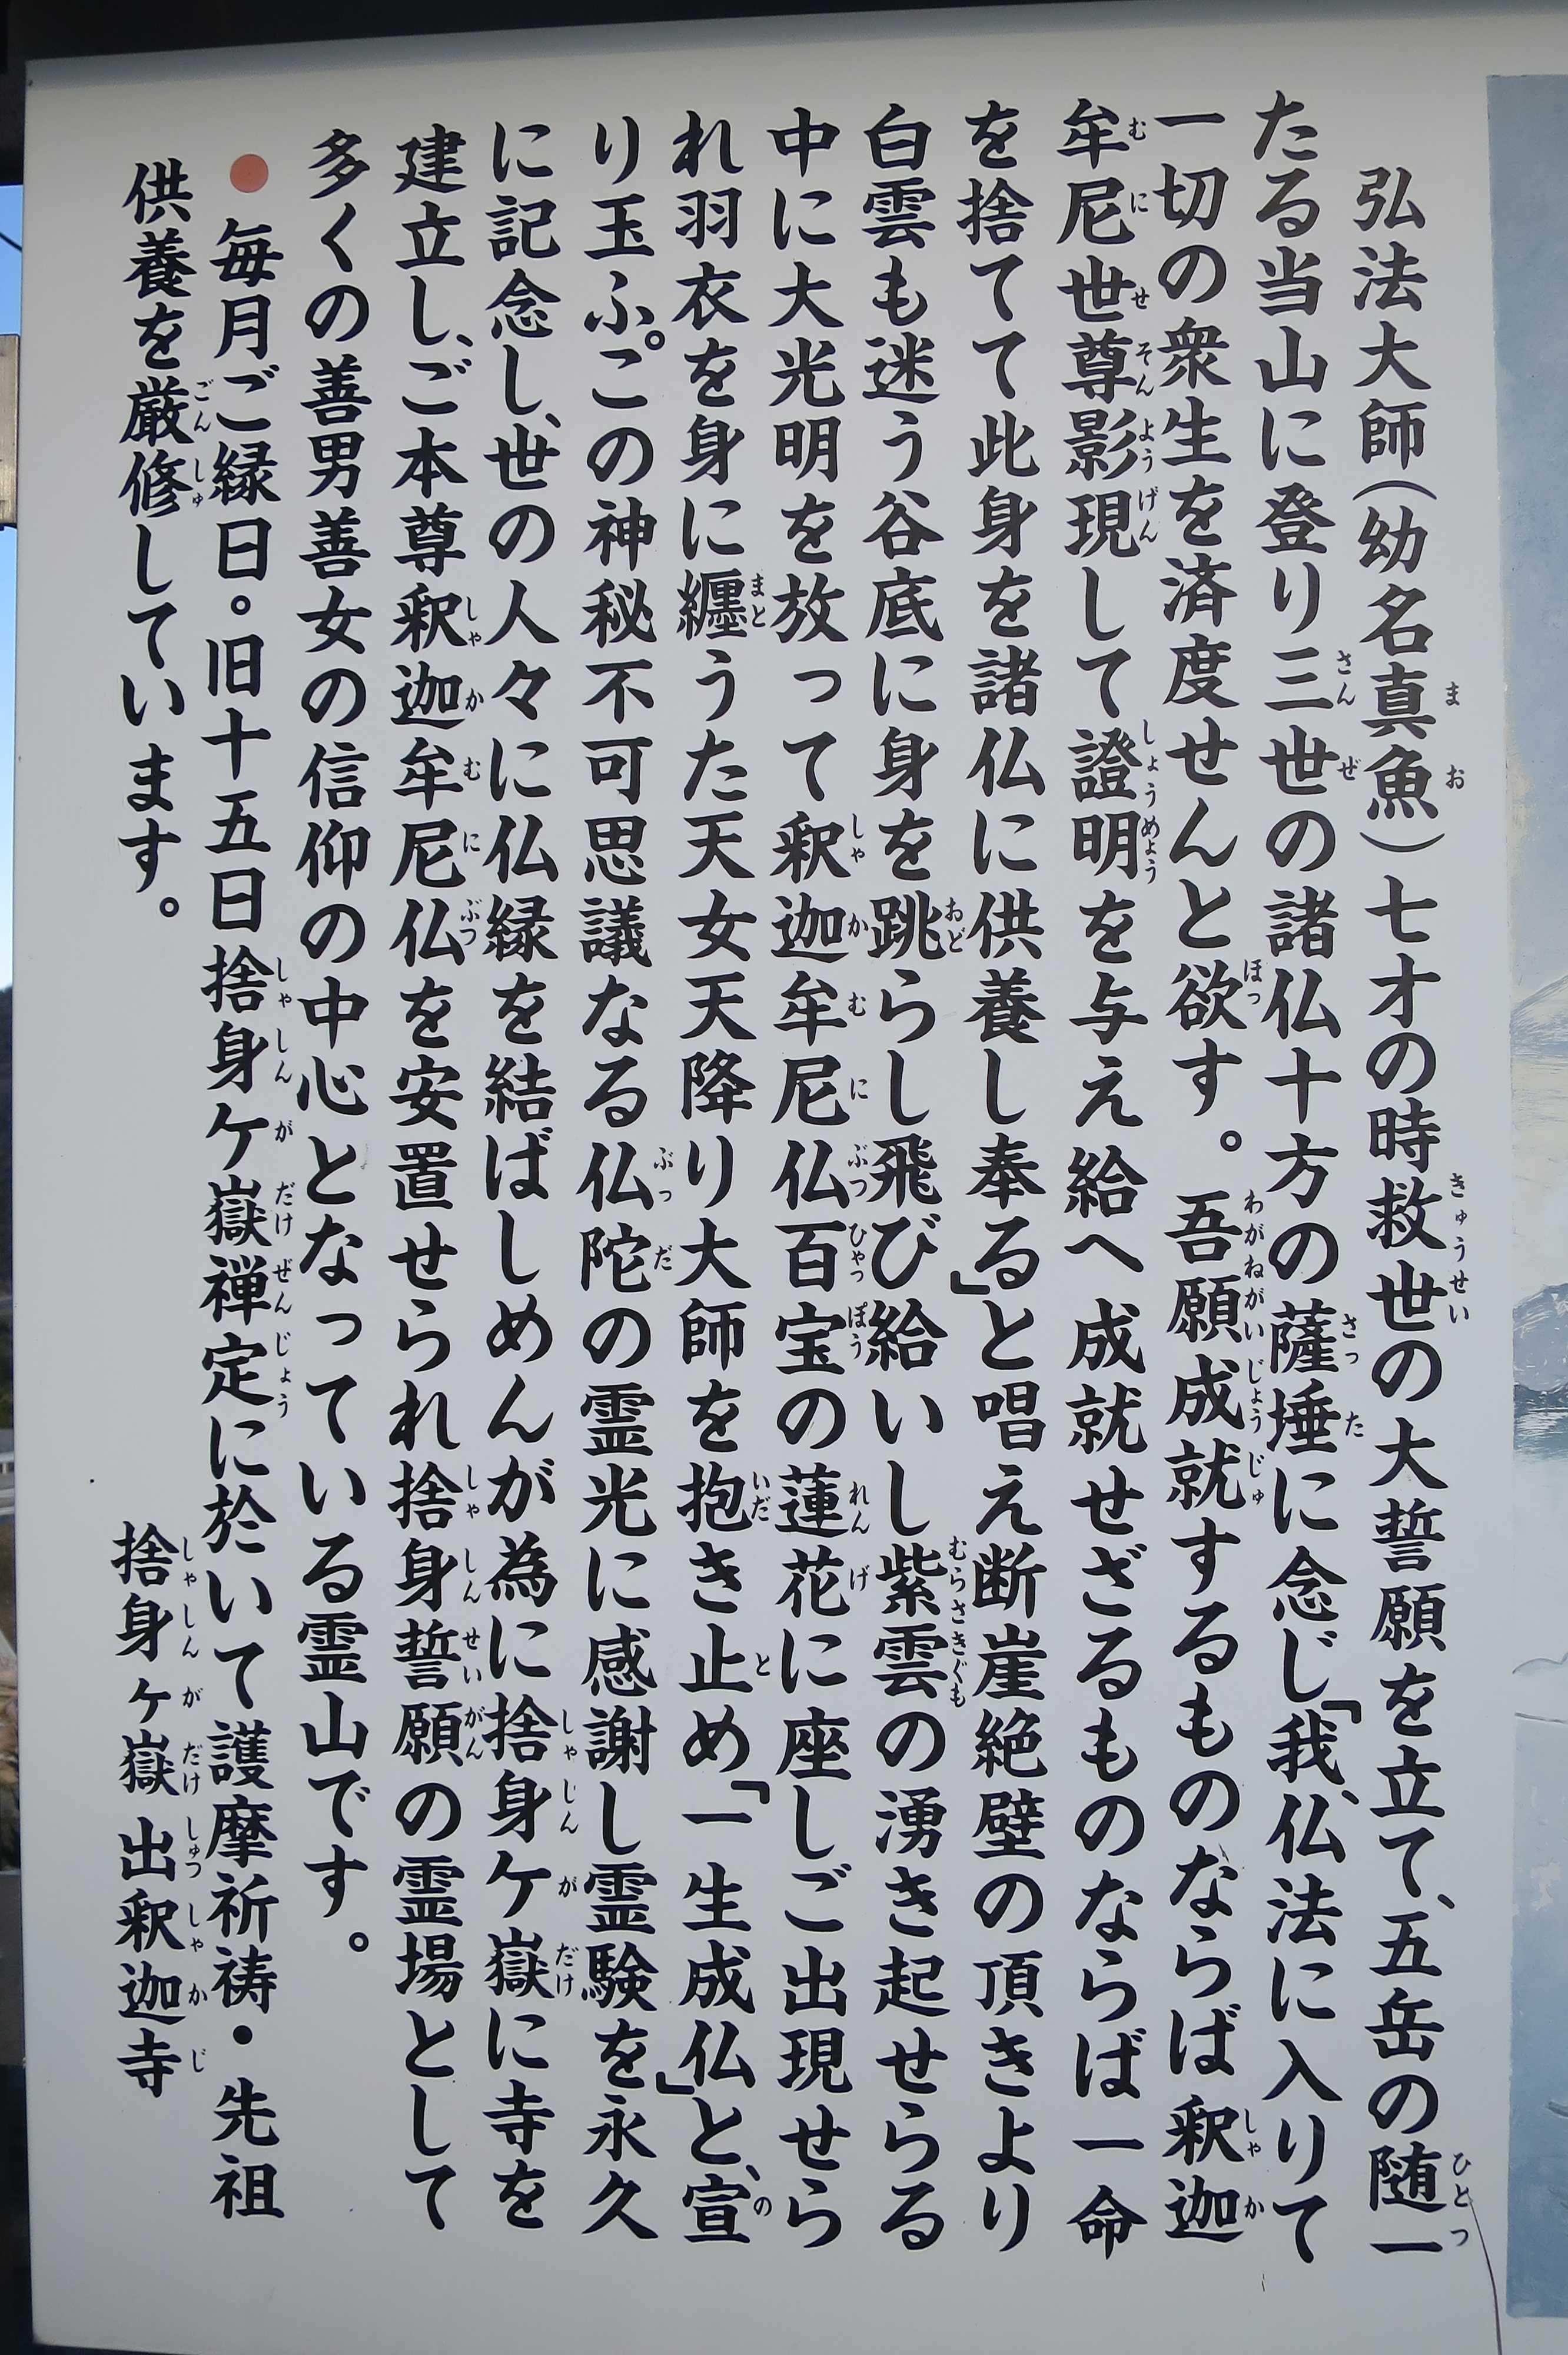 出釈迦寺 - 奥の院捨身ヶ嶽禅定